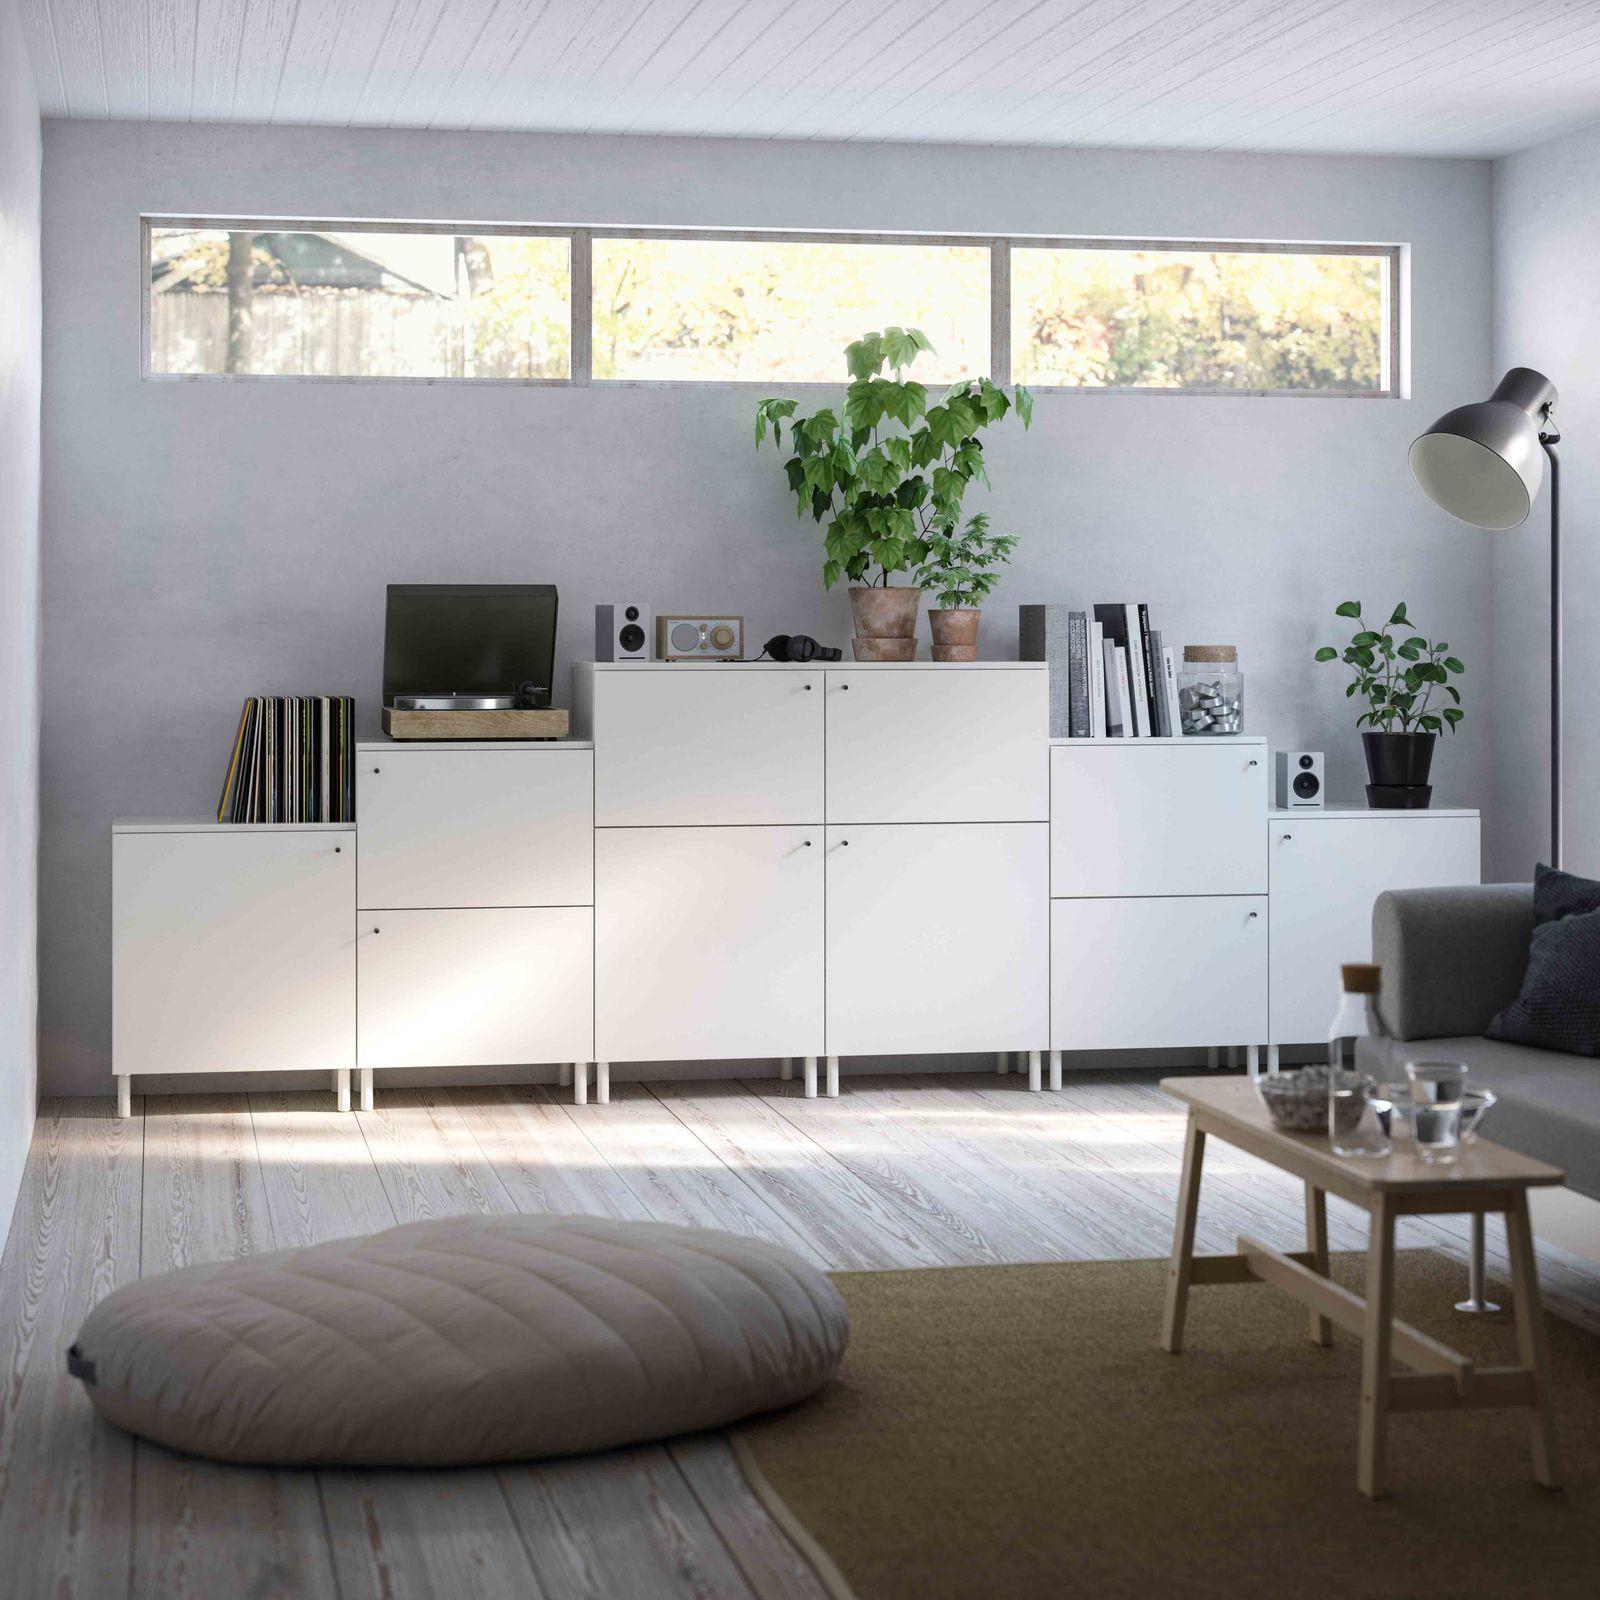 7 Reasons Why Platsa Is One Of Ikea S Most Important Product Ranges In Recent Years Ikea Wardrobe Ikea Wardrobe Storage Ikea Living Room